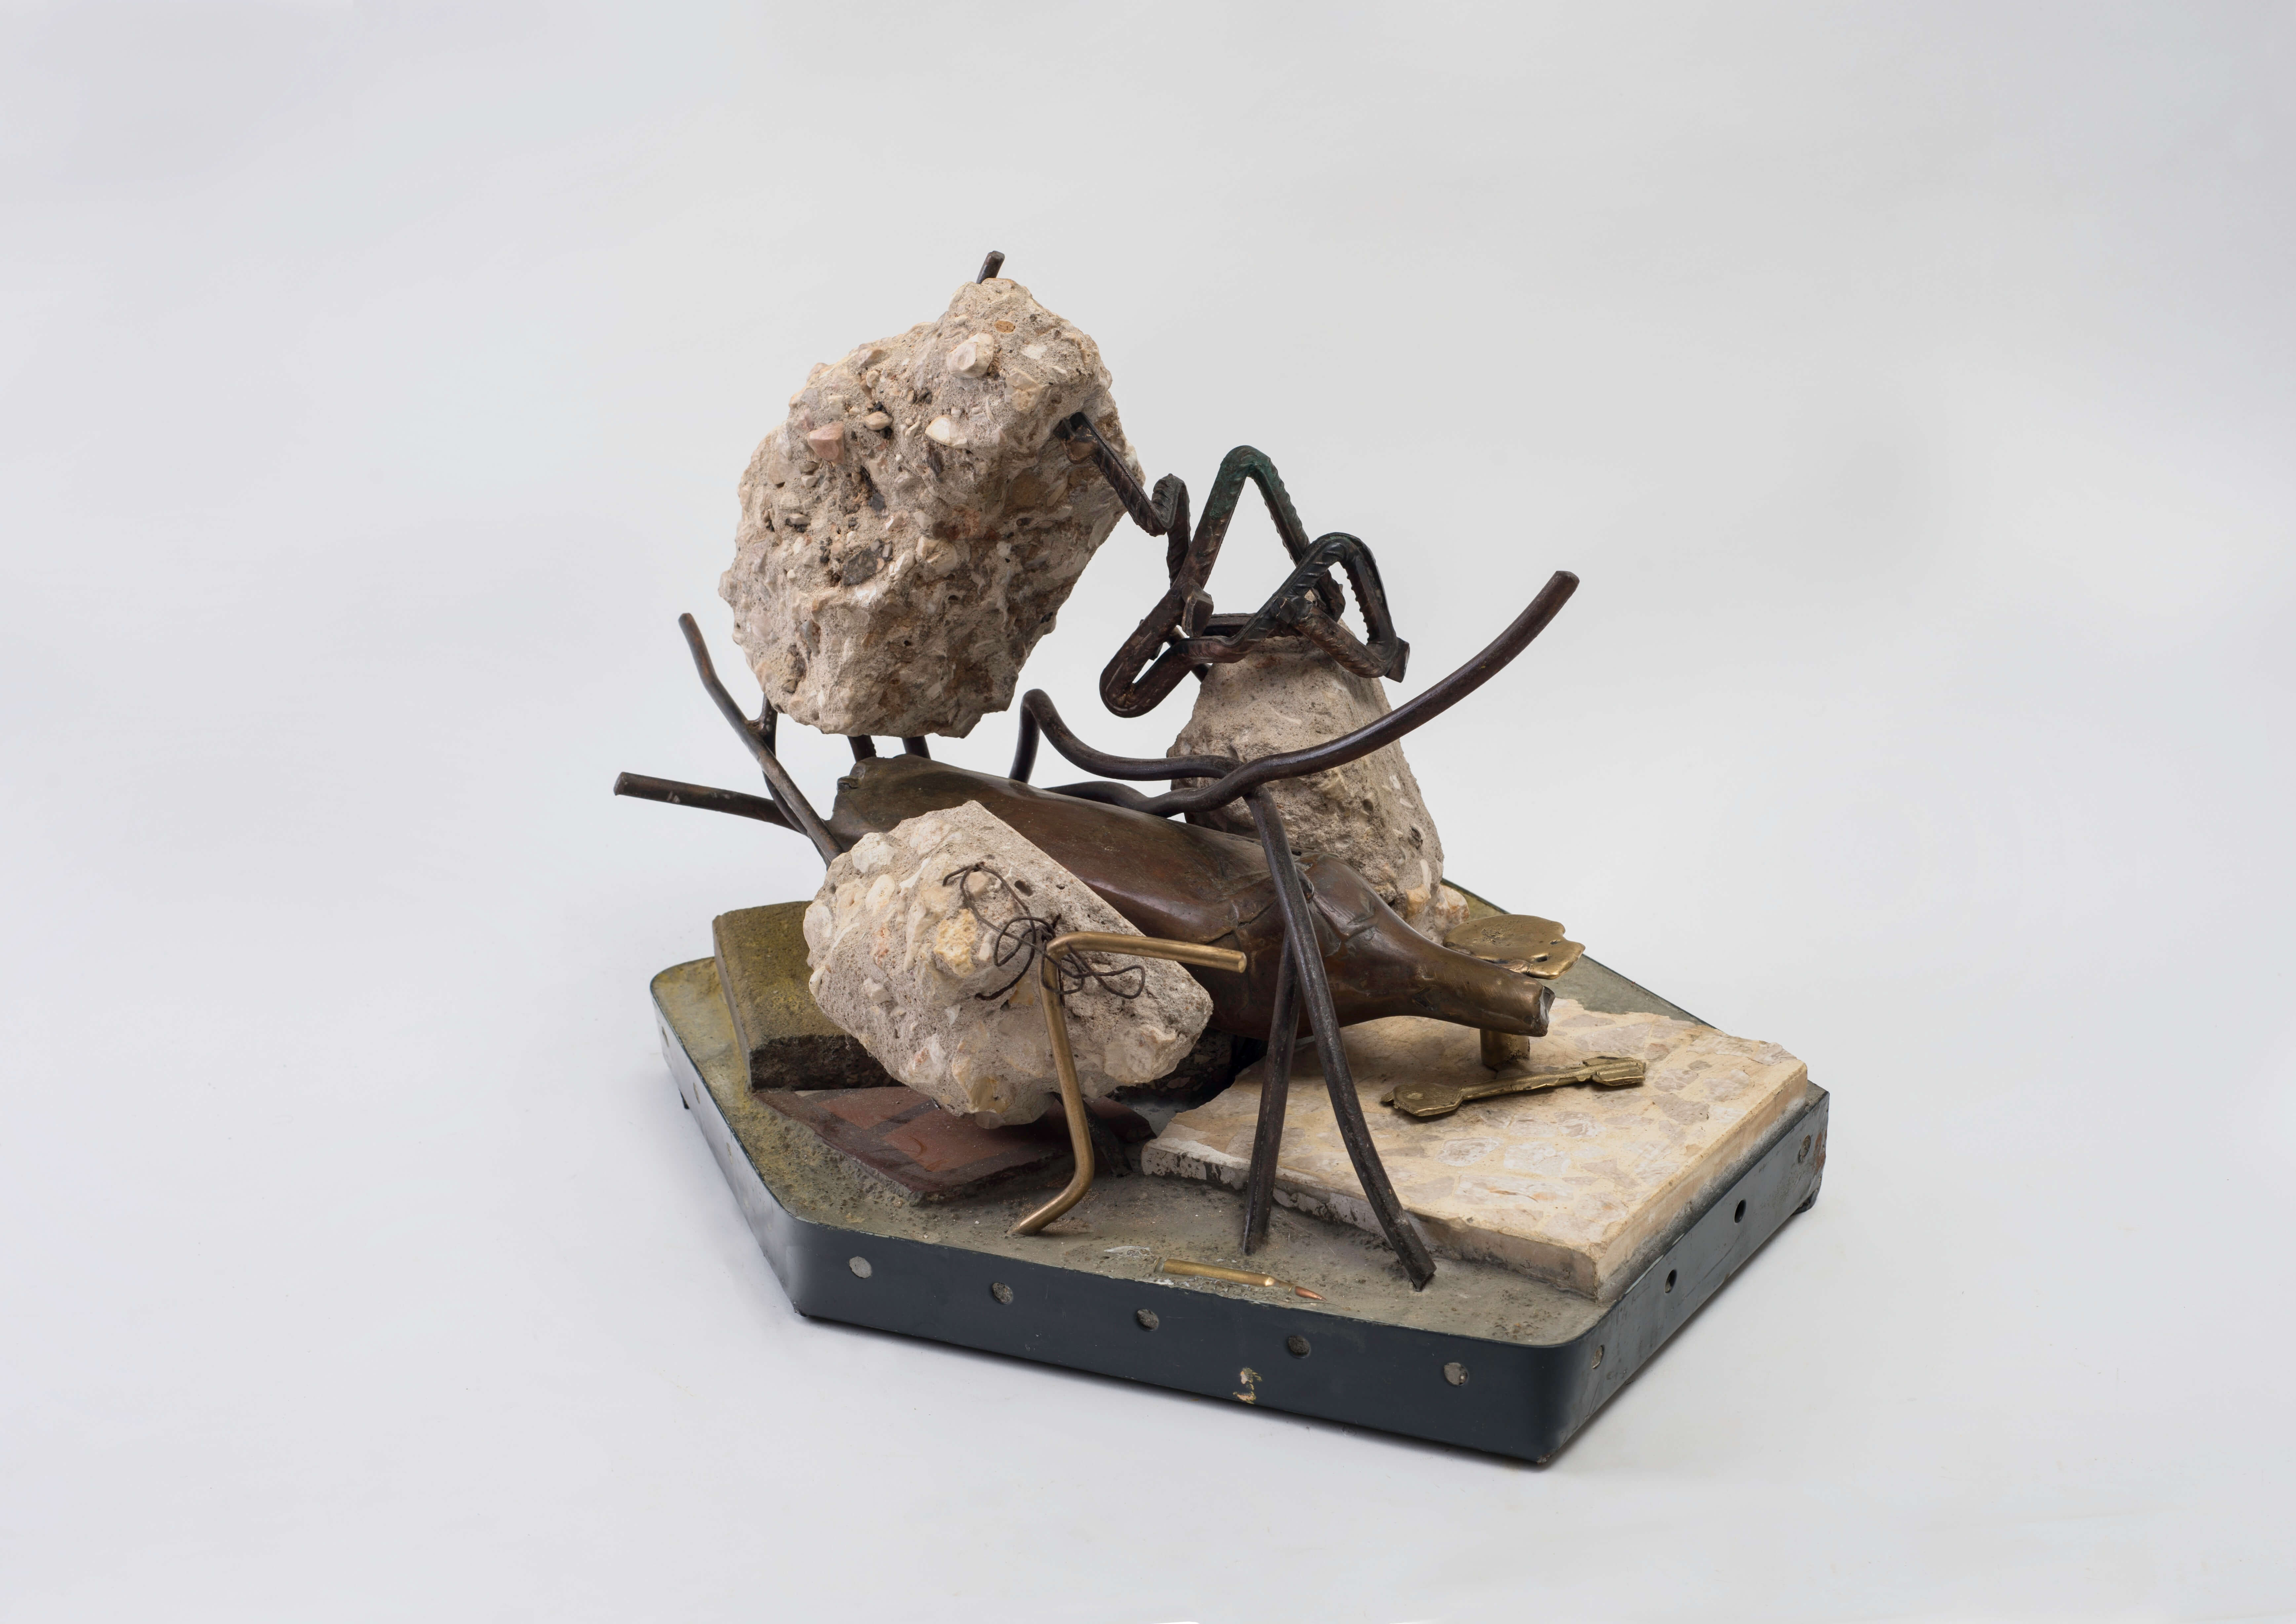 1231_Drora Dominey, Scorpion, 2015, Bronze, iron, concrete and buildings debris, 27x32x40 cm-6946x4912